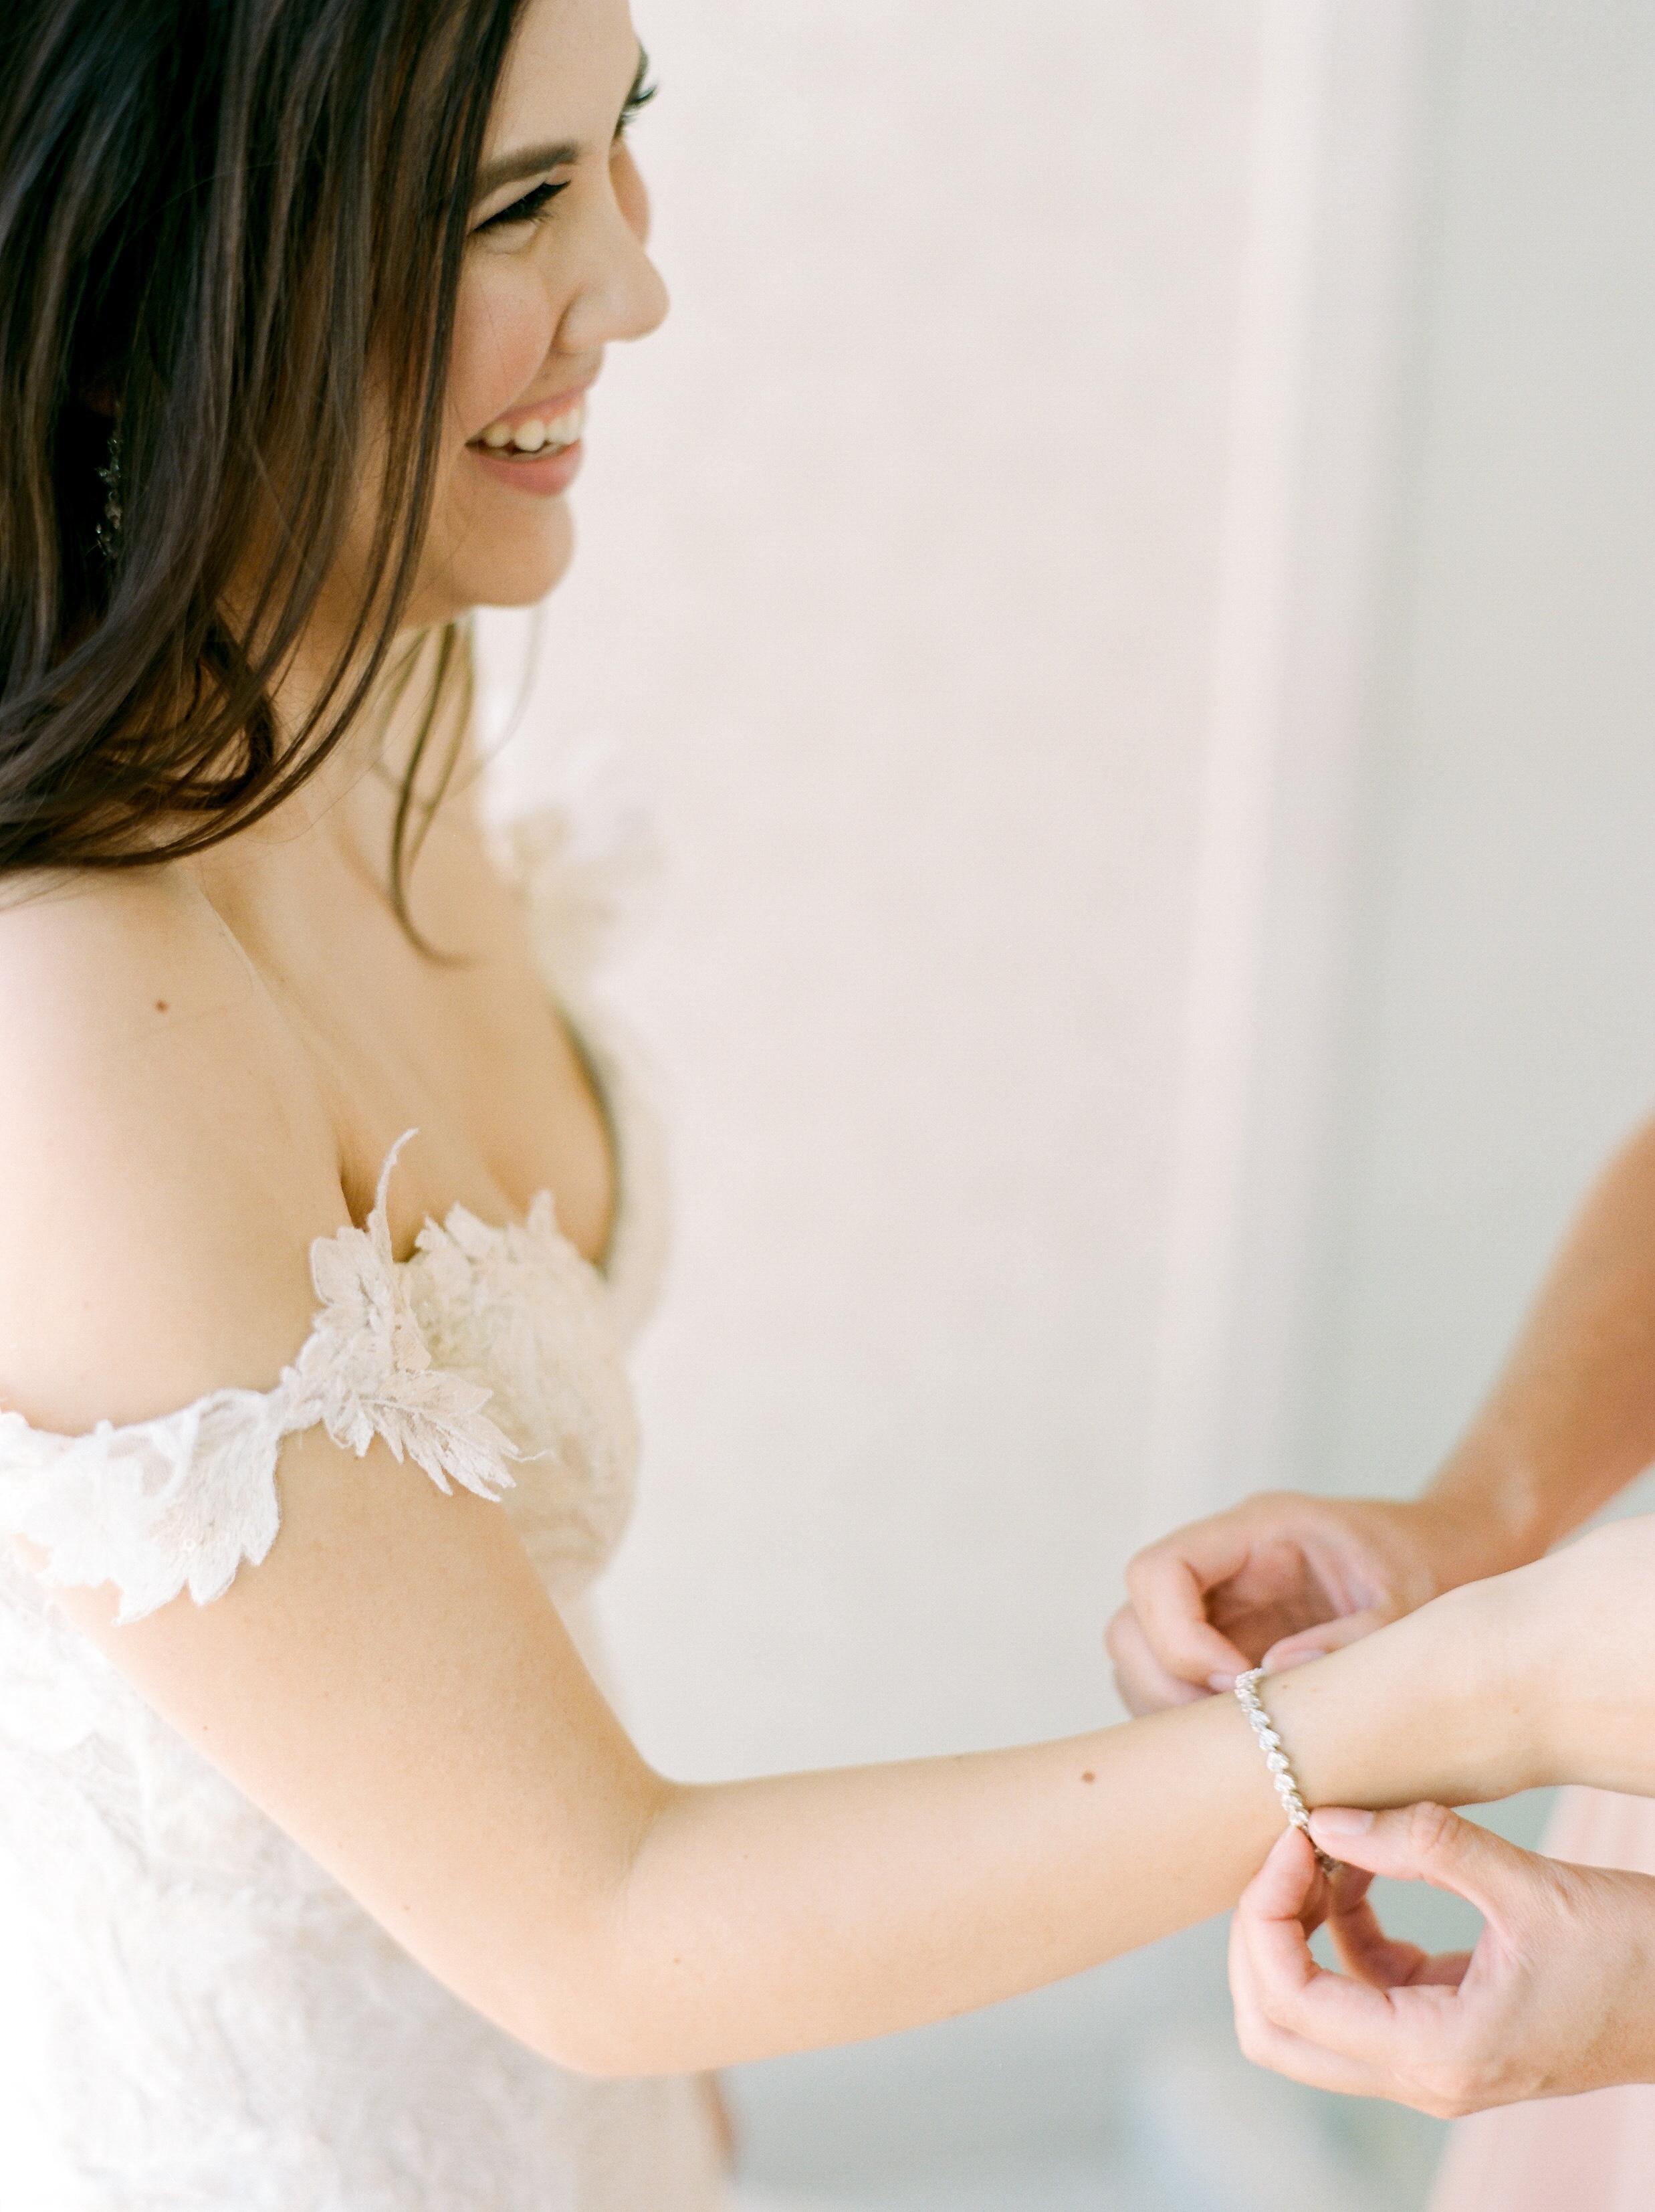 Martha-Stewart-Wedding-Dana-Fernandez-Photography-Josh-Texas-Film-Houston-Wedding-Fine-Art-Photographer-McGovern-Centennial-Gardens-Top-Best-8.jpg